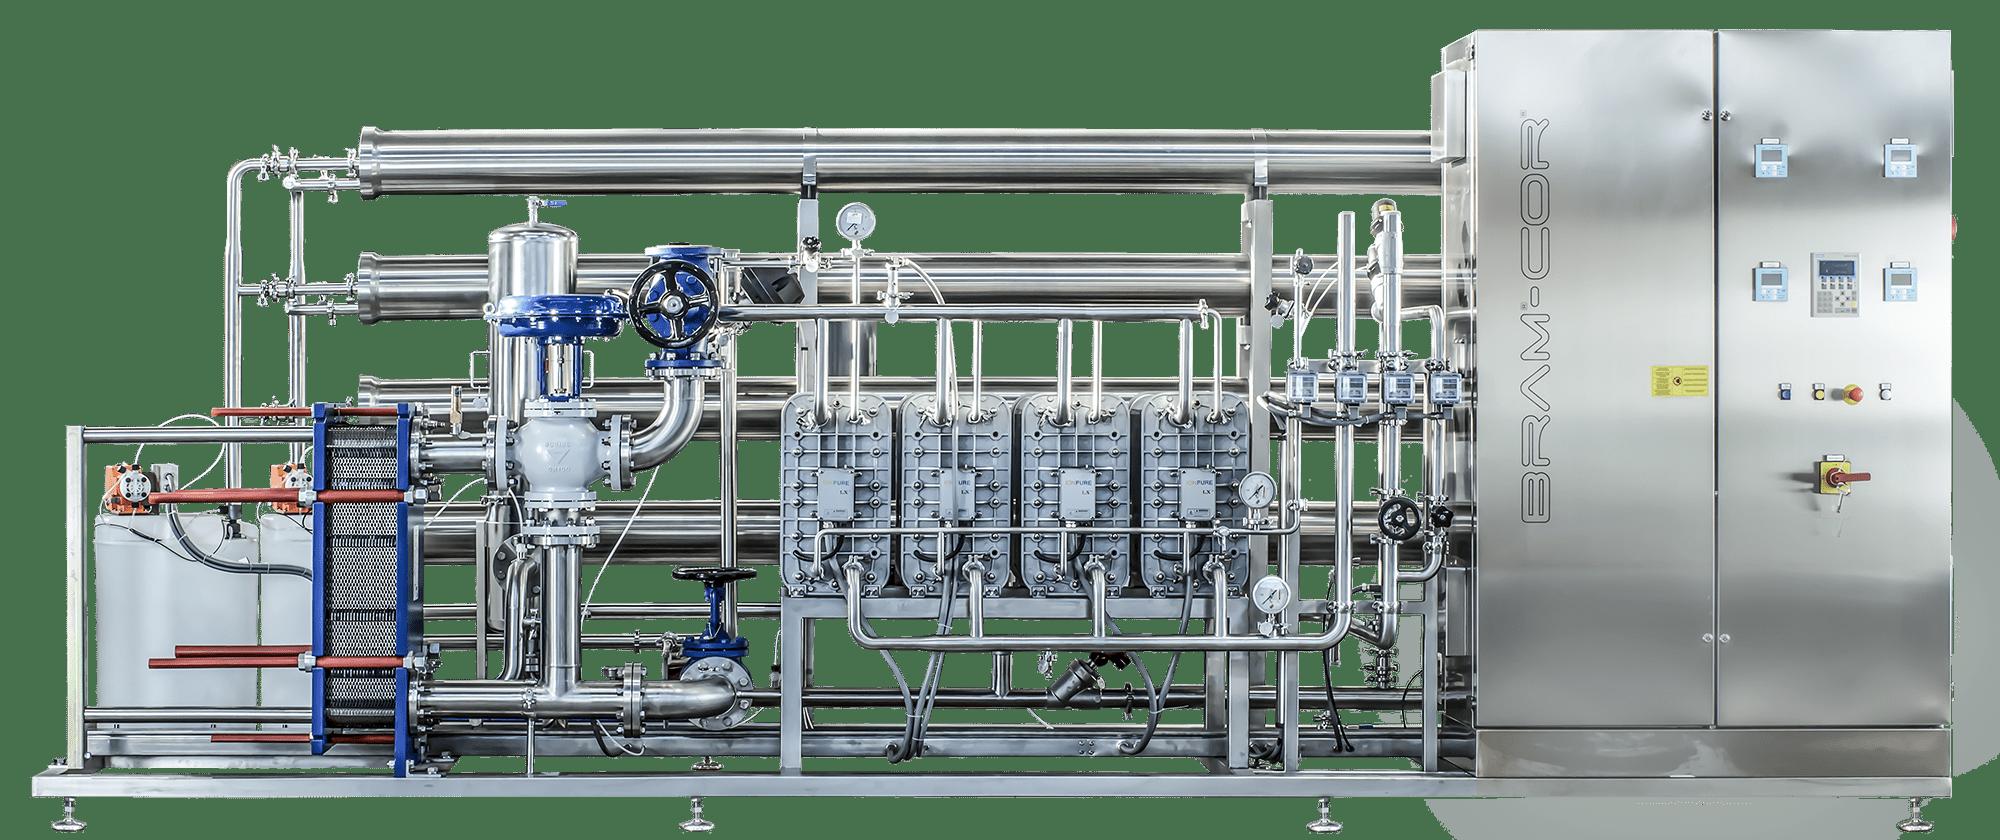 Bram-Cor Reverse Osmosis system